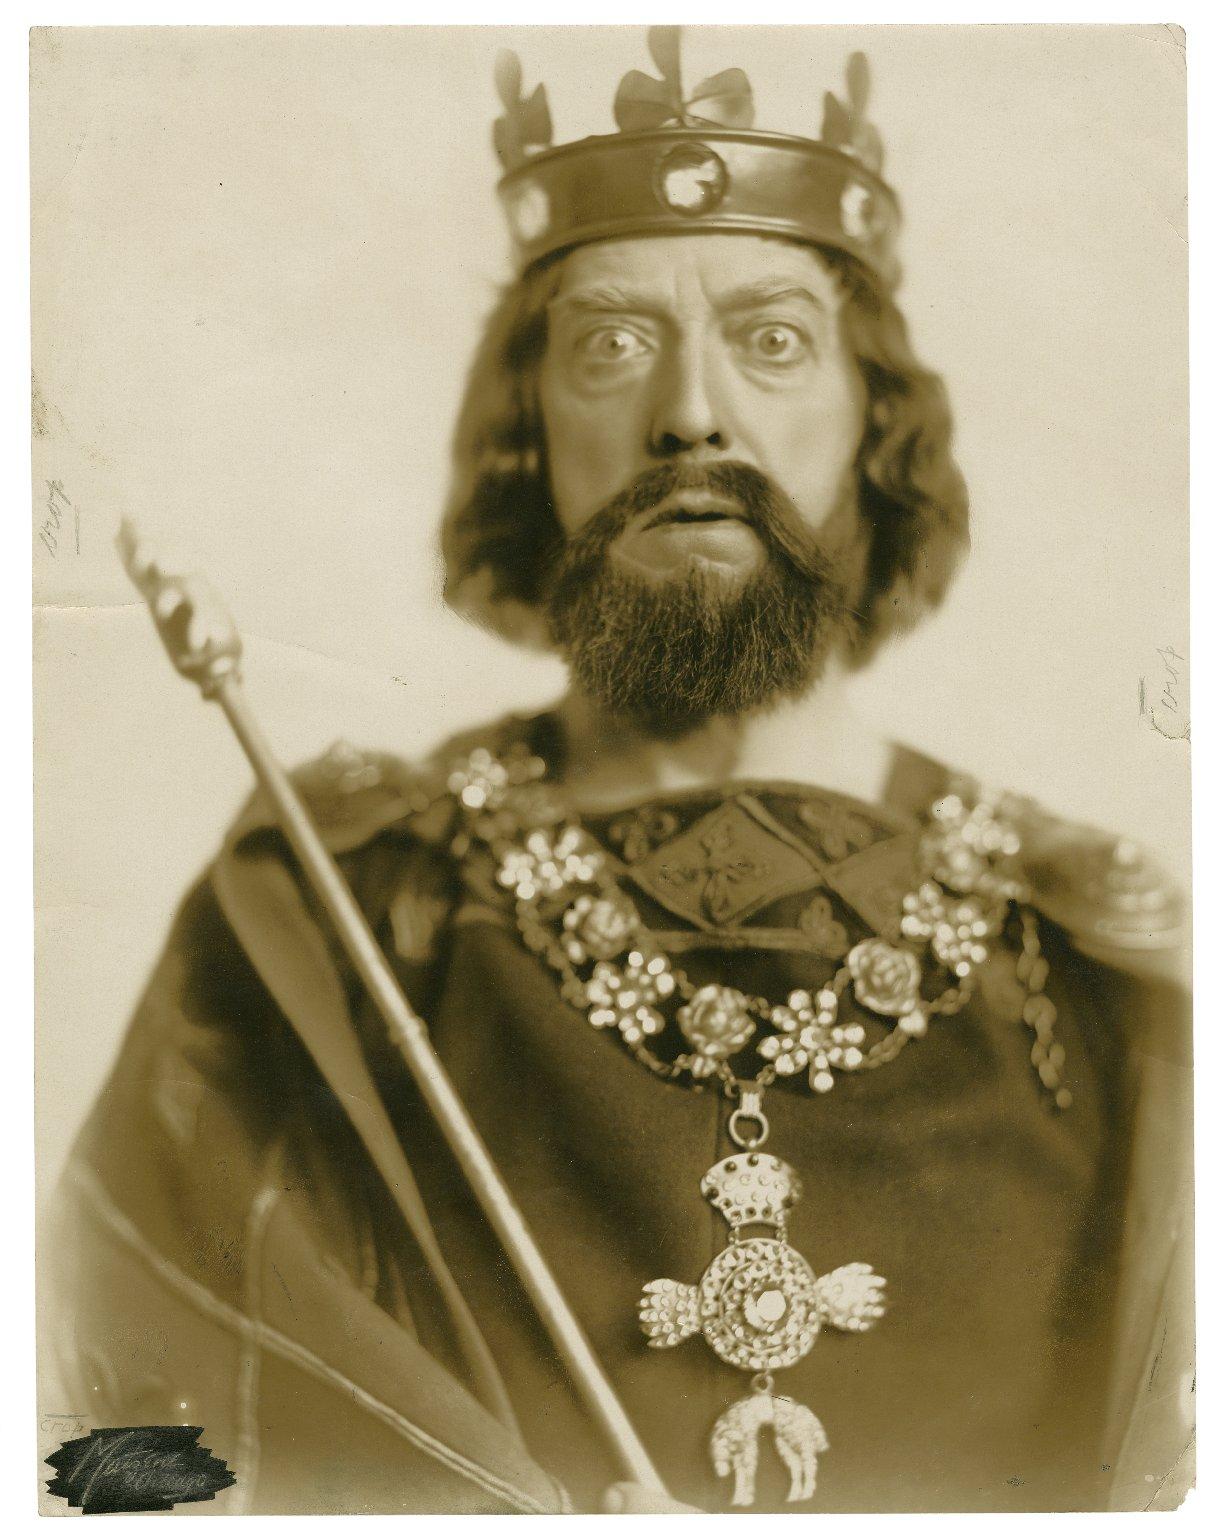 Robert_Mantell_as_King_John